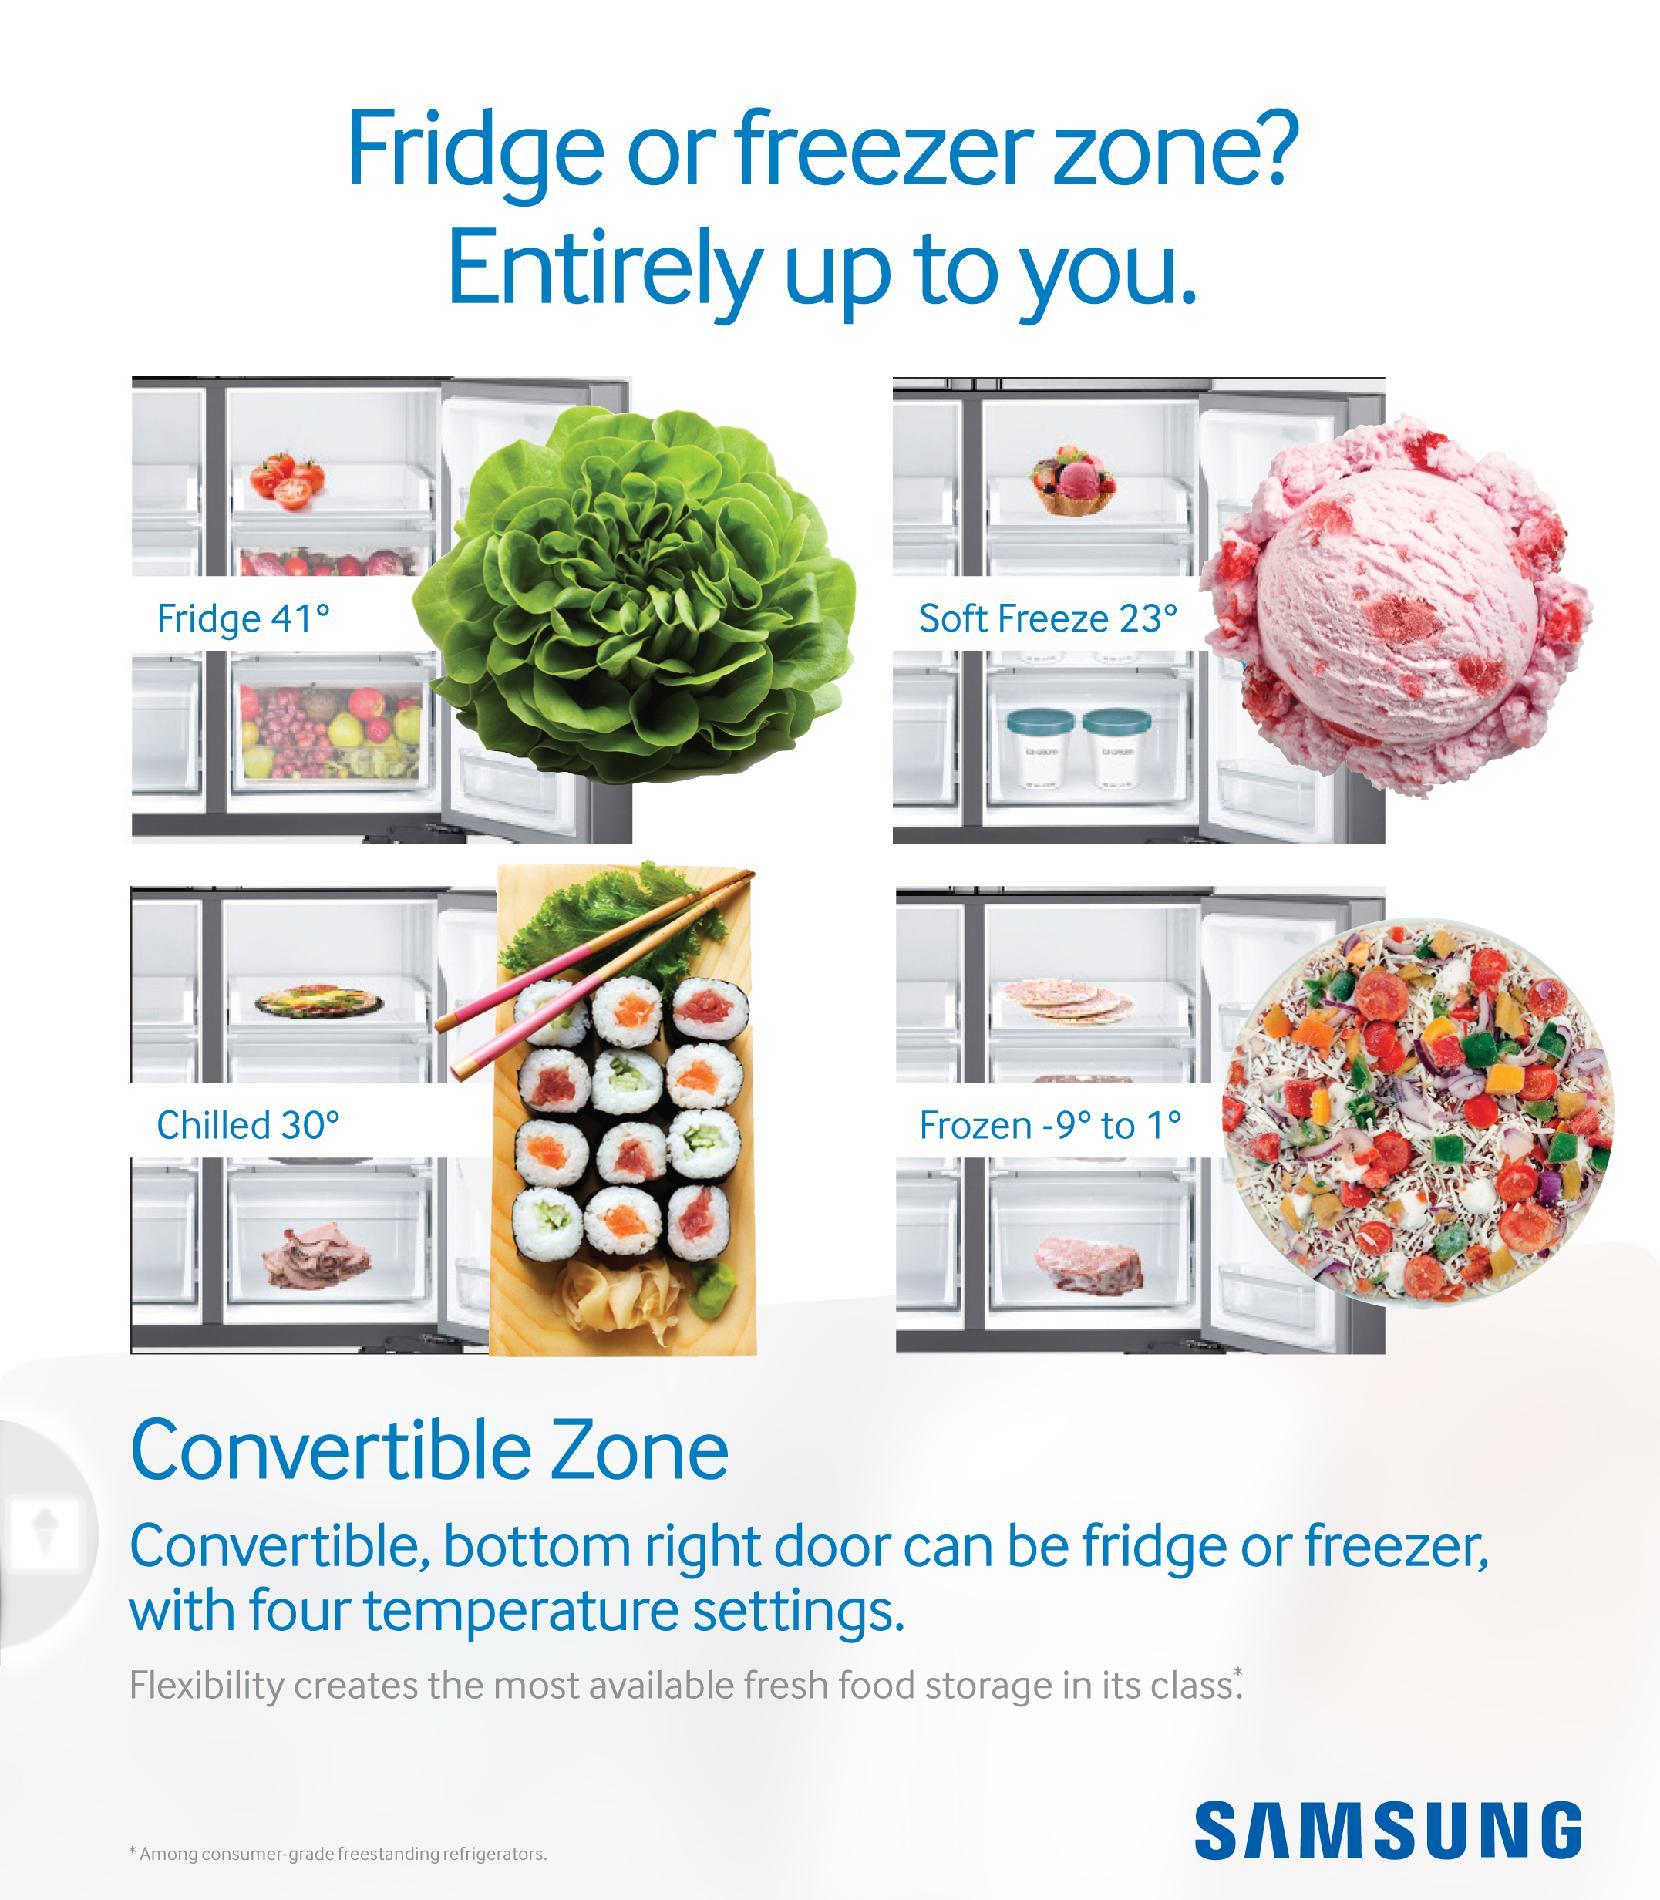 Samsung 31.7 cu. ft. 4-Door Flex™ Refrigerator w/ Convertible Zone - Stainless Steel